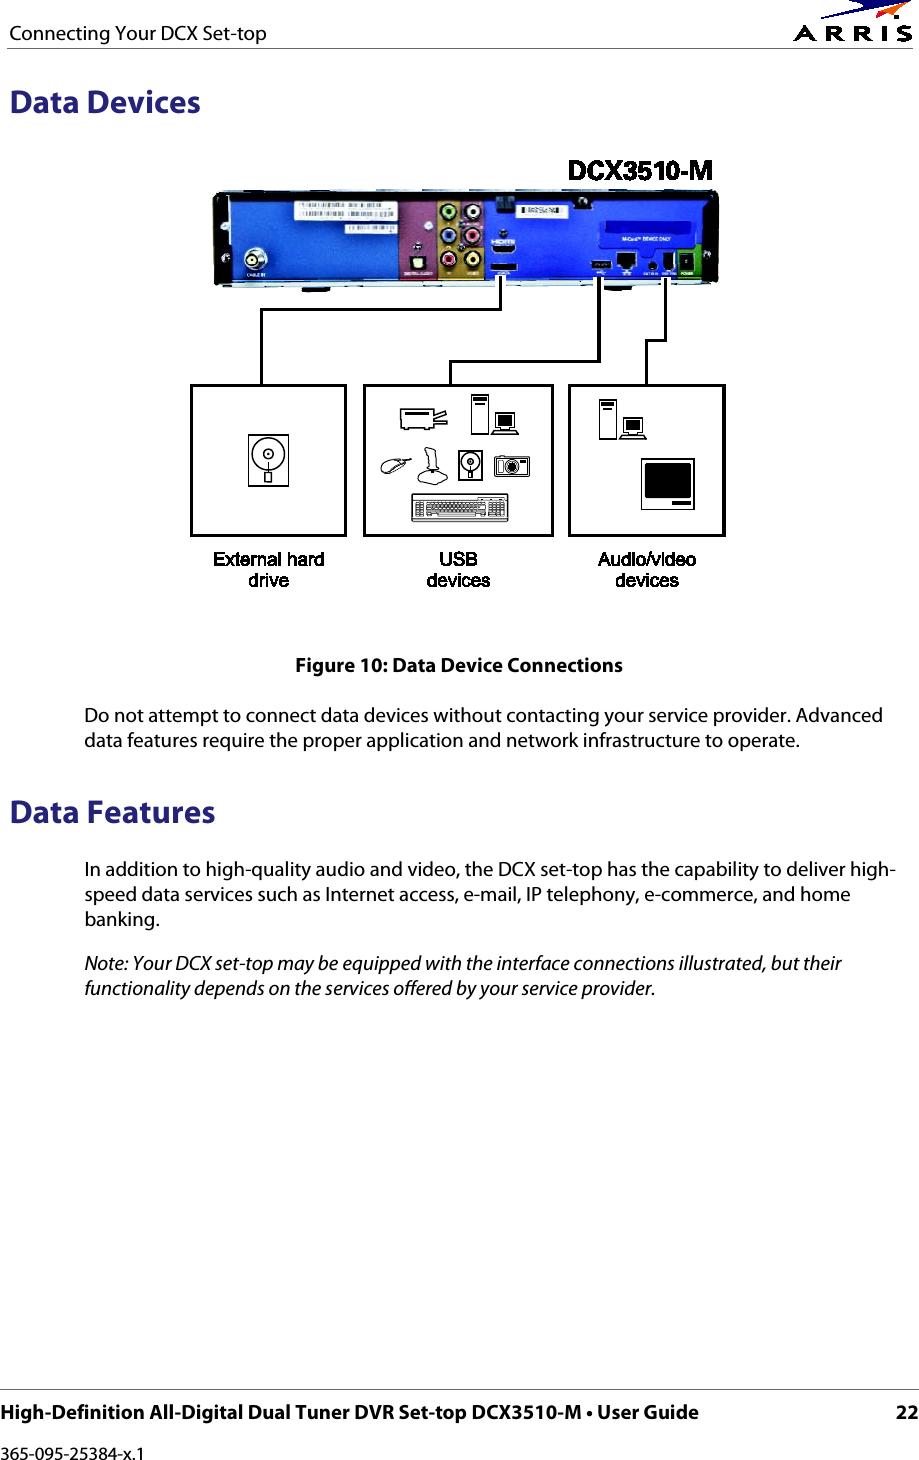 Arris DCX3510 M High Definition All Digital Dual Tuner DVR Set top